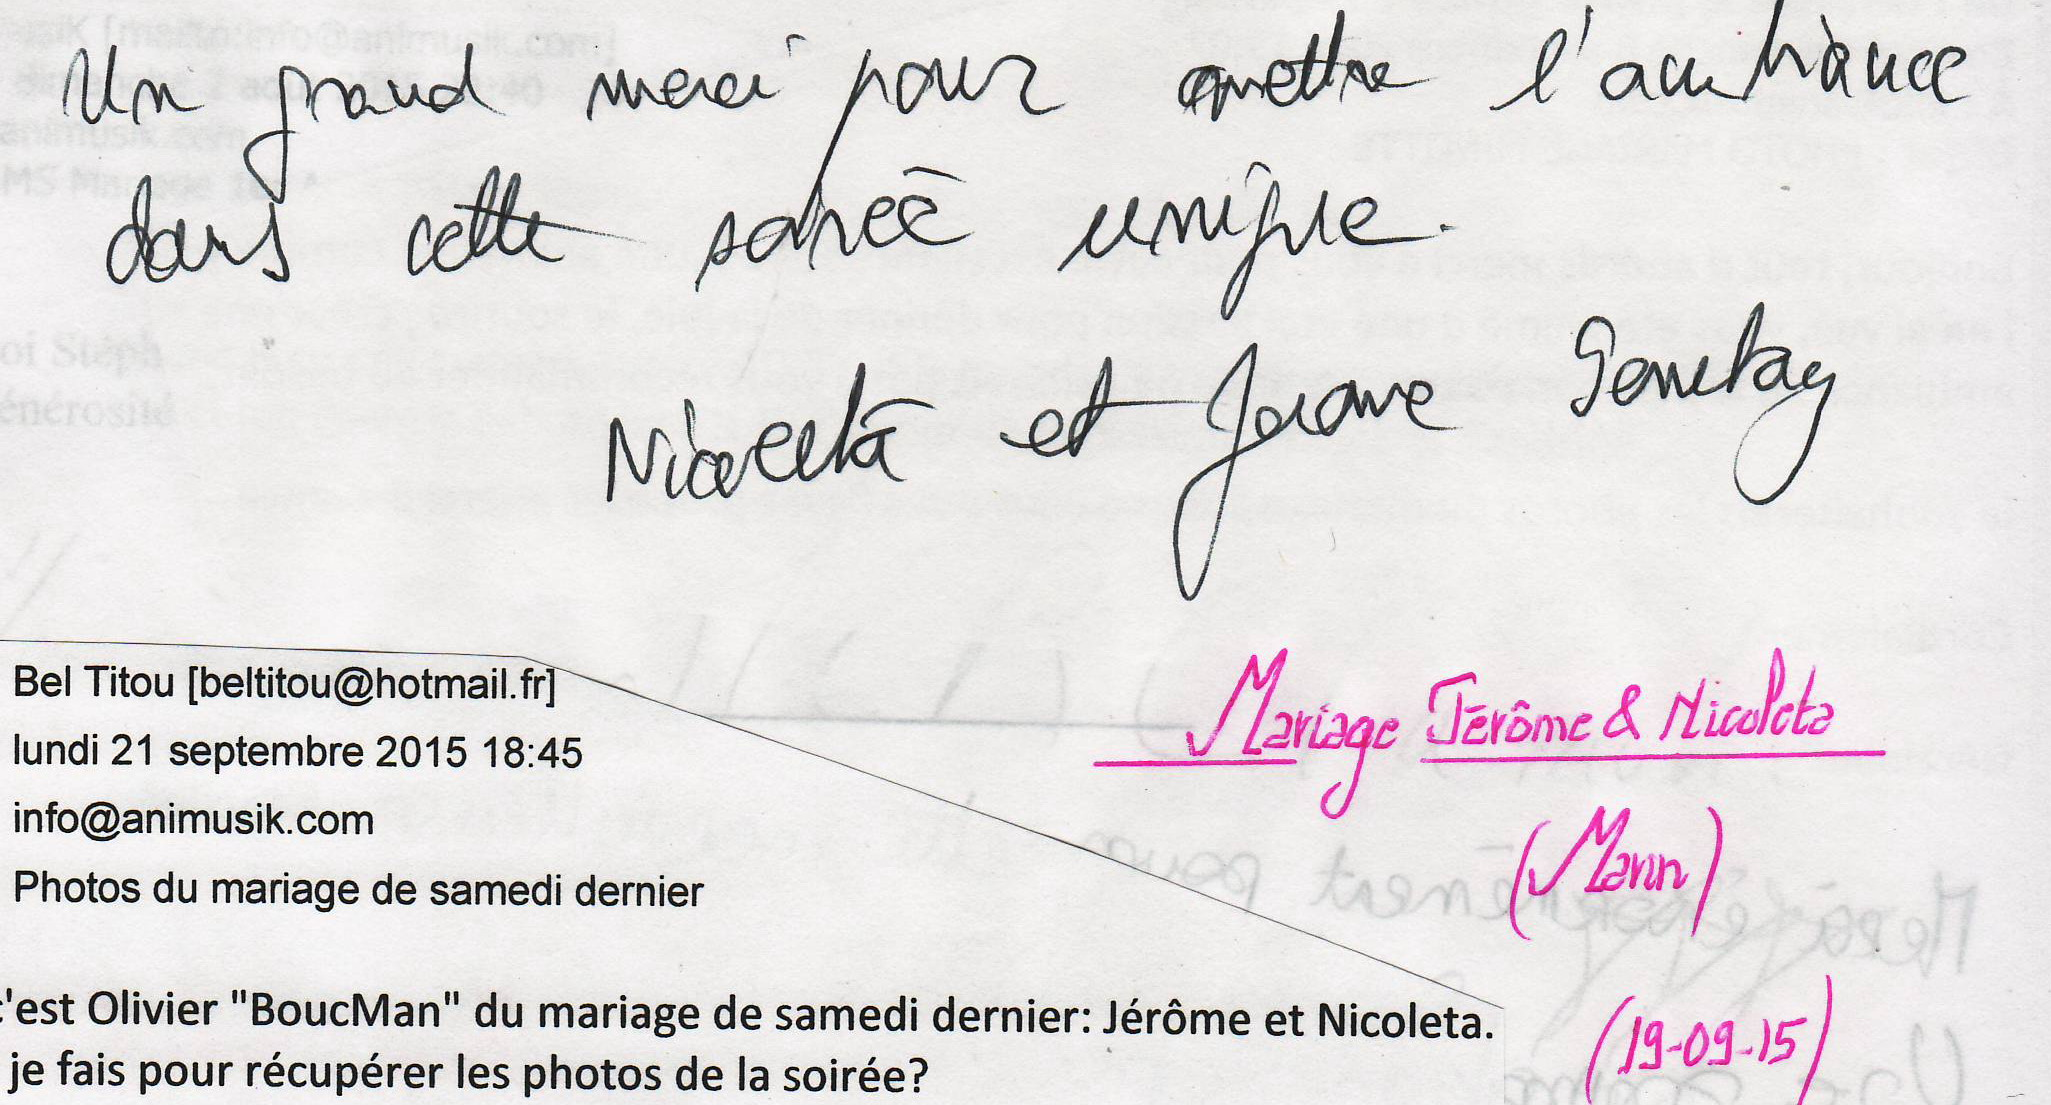 Mariage GENETAY Jérôme & Nicoleta (Marin) (19-09-2015)